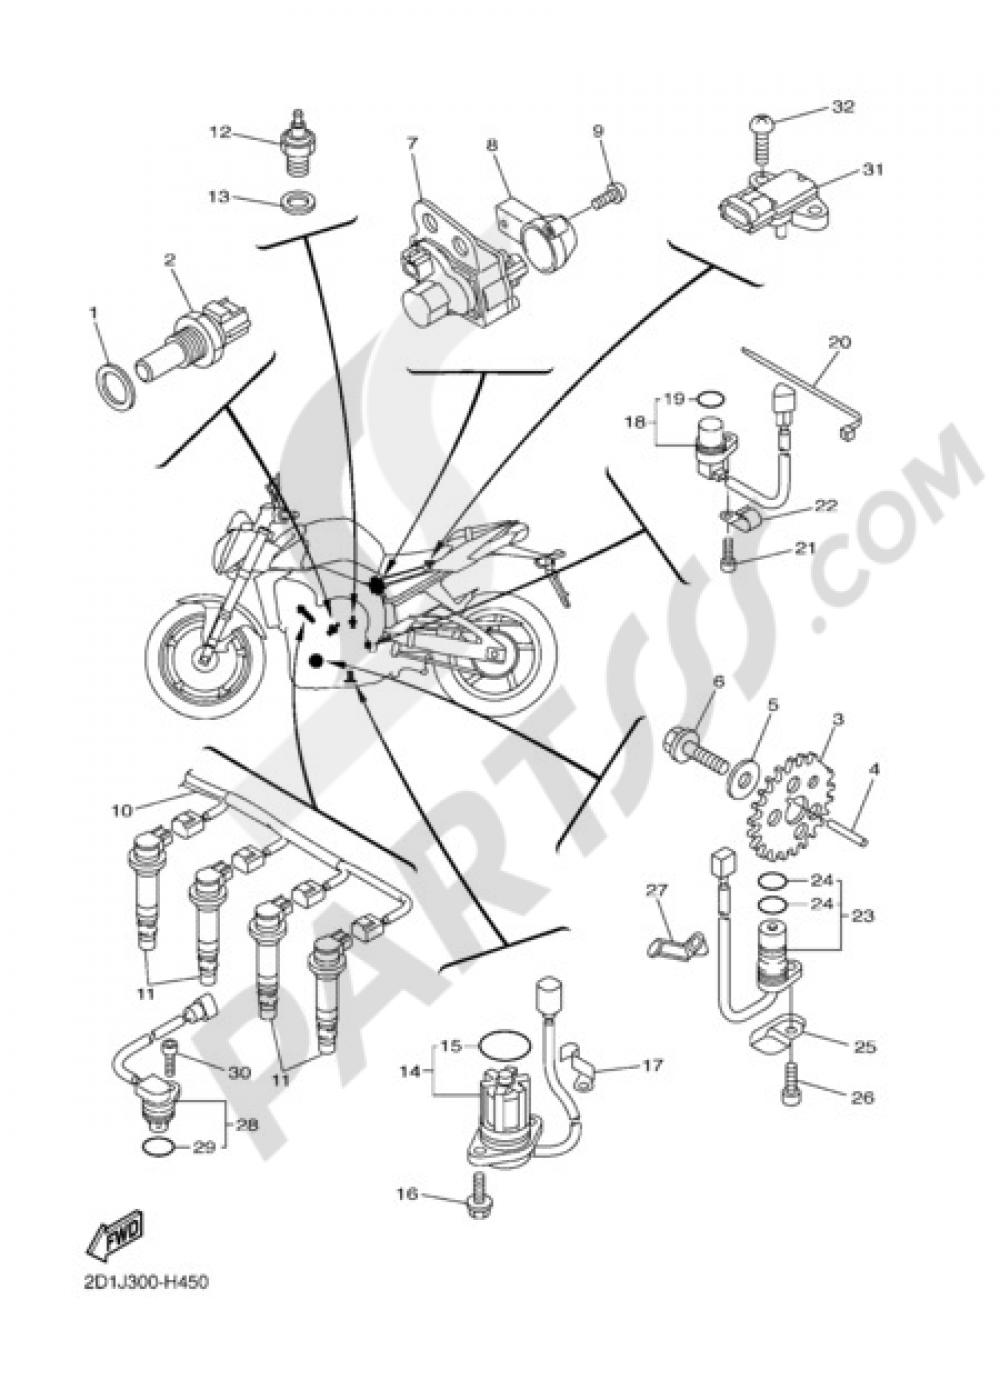 ELECTRIC EQUIPMENT 1 Yamaha FZ1 ABS 2012